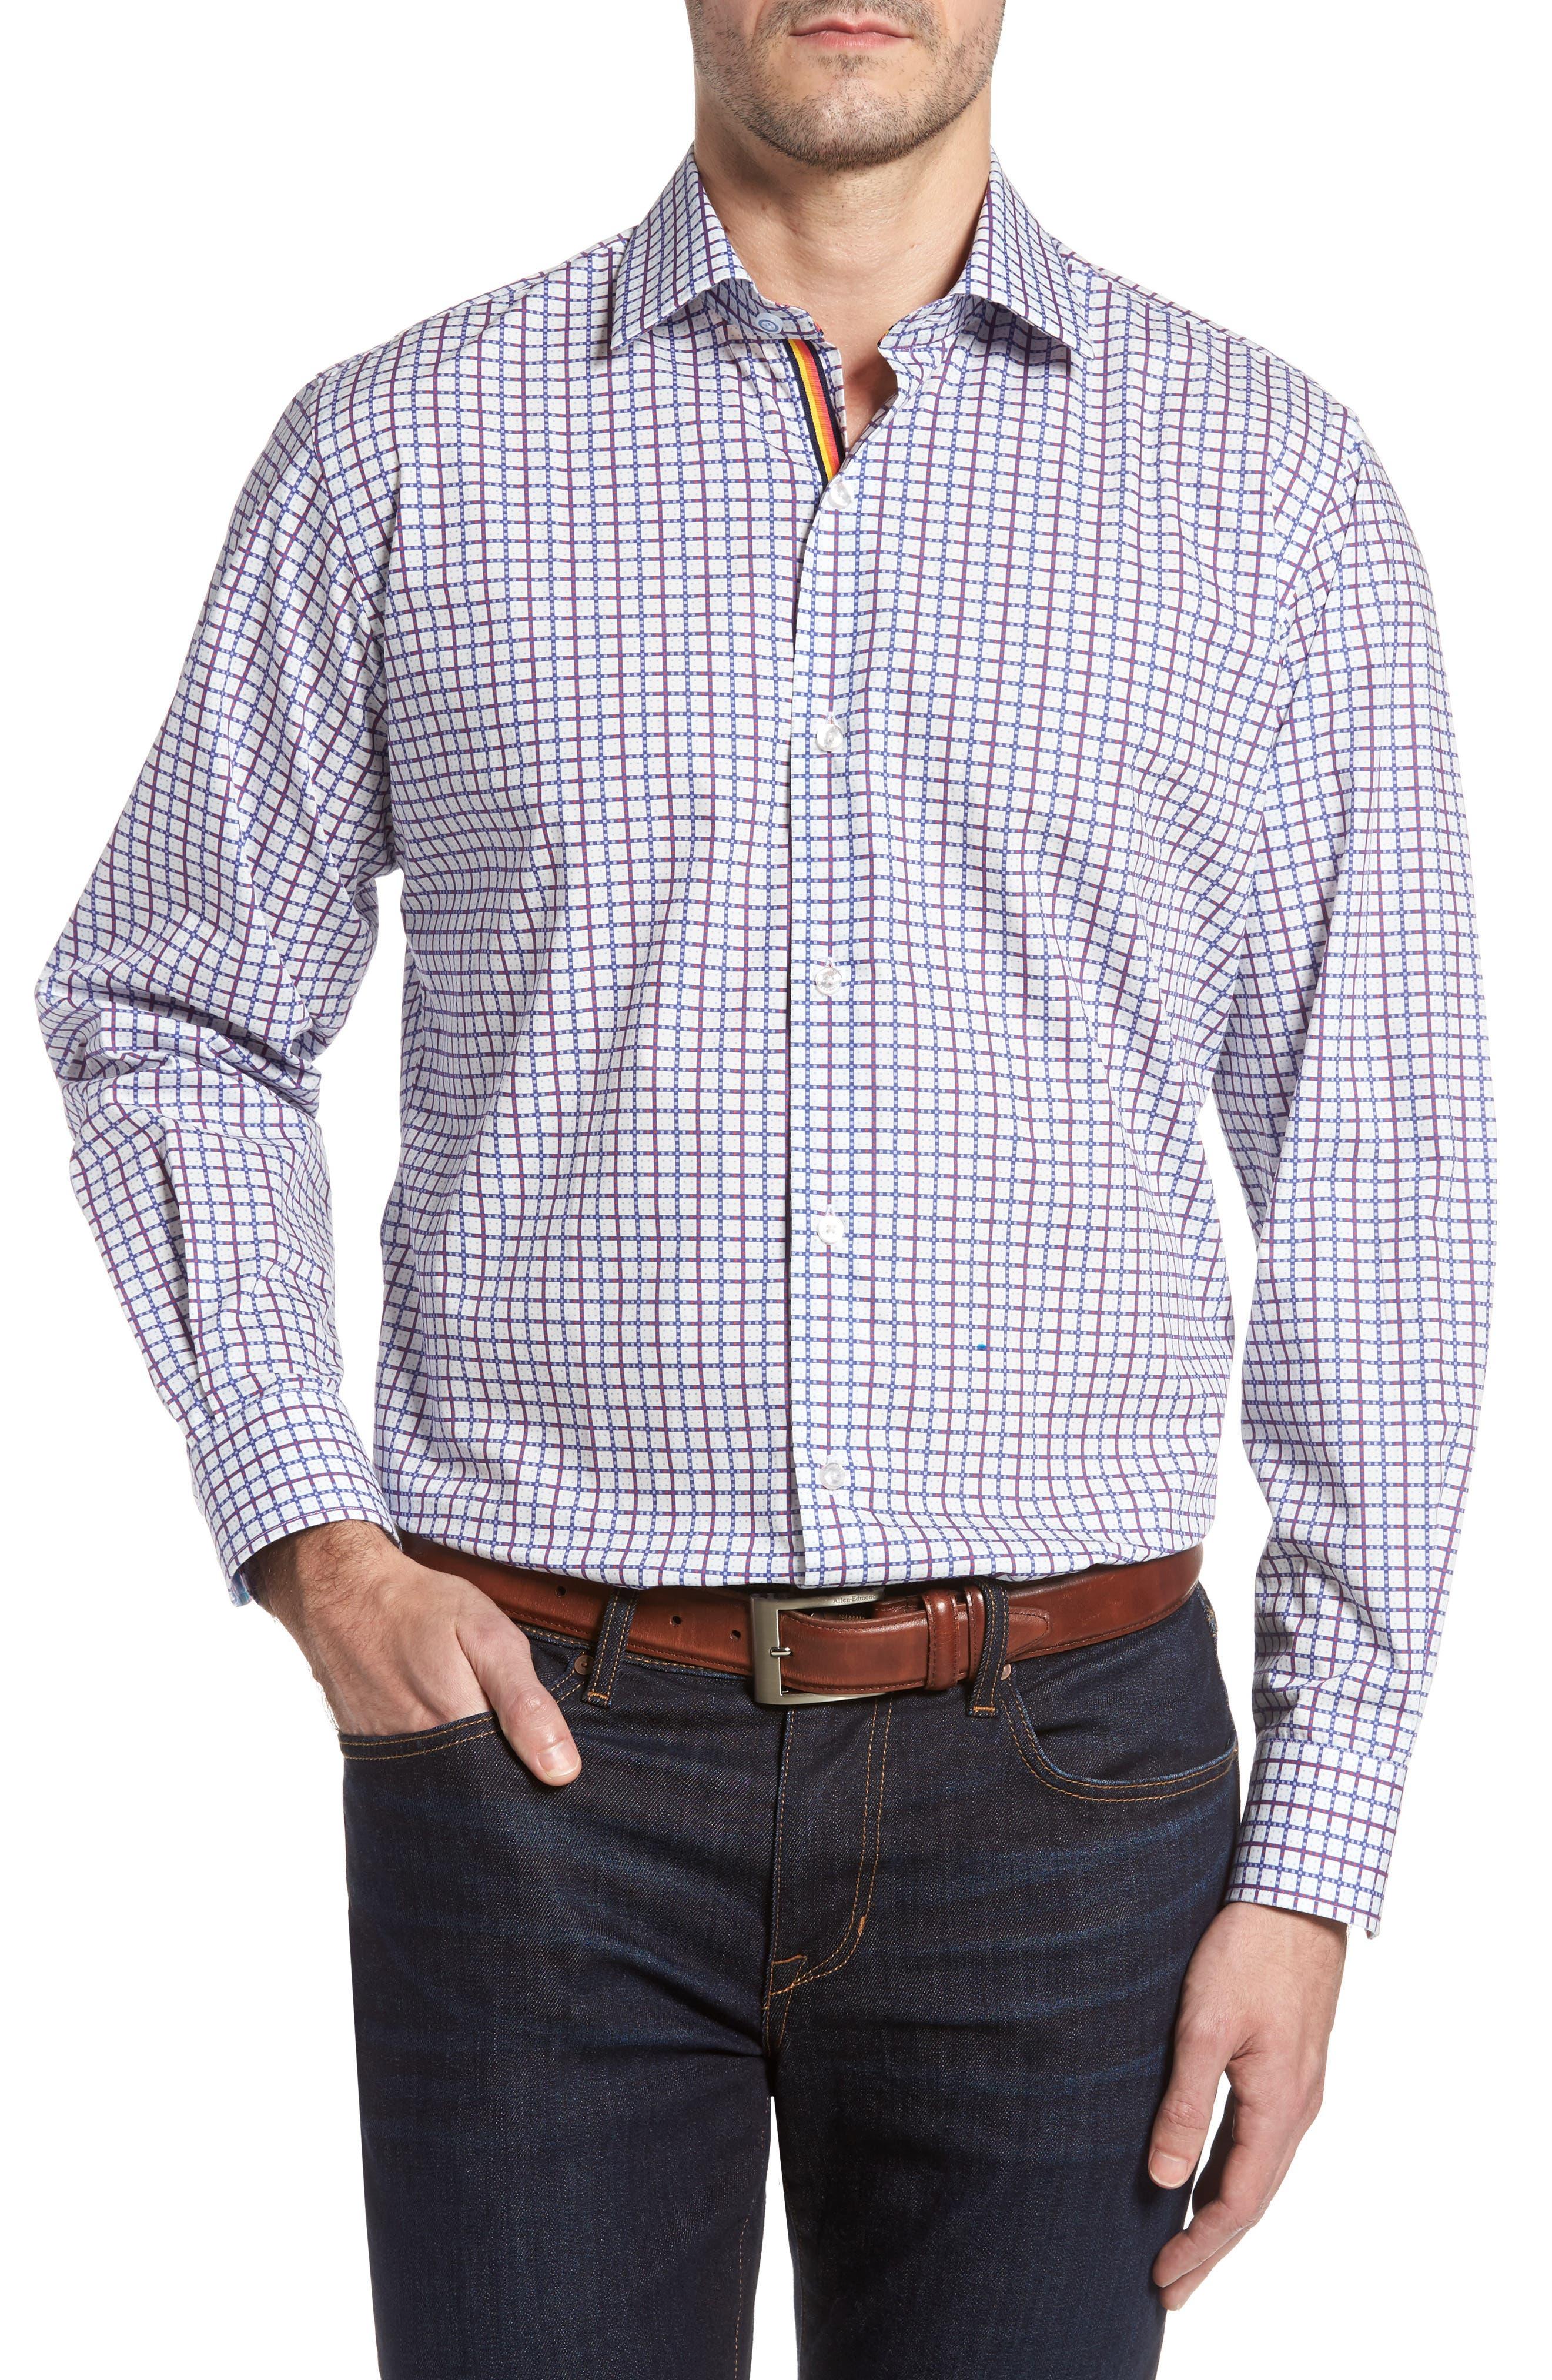 Magnolia Sport Shirt,                         Main,                         color, 500